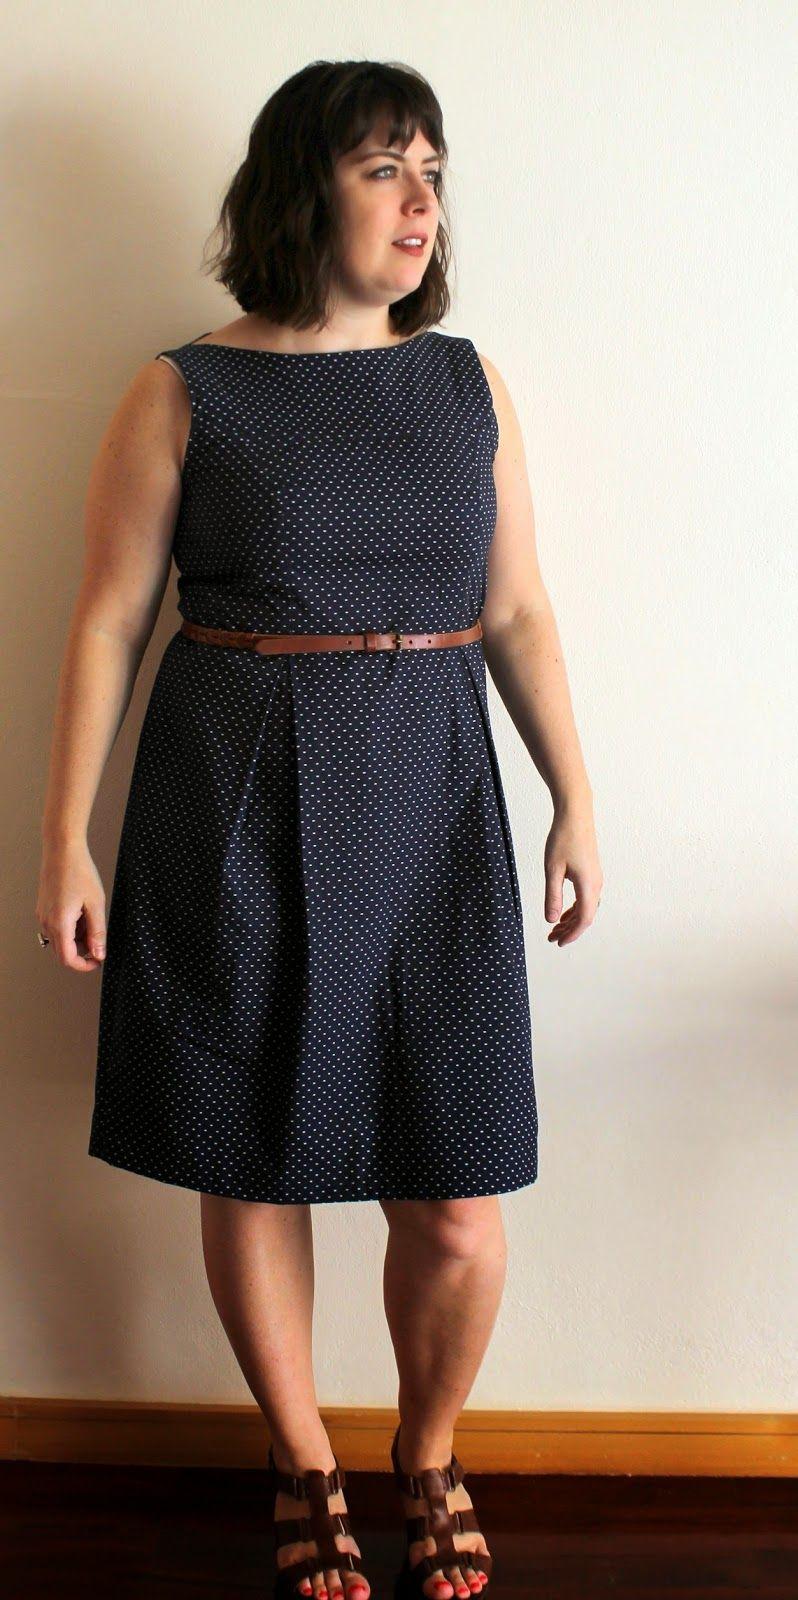 Cookin\' & Craftin\': Modified Itch to Stitch Marbella Dress | Stuff I ...